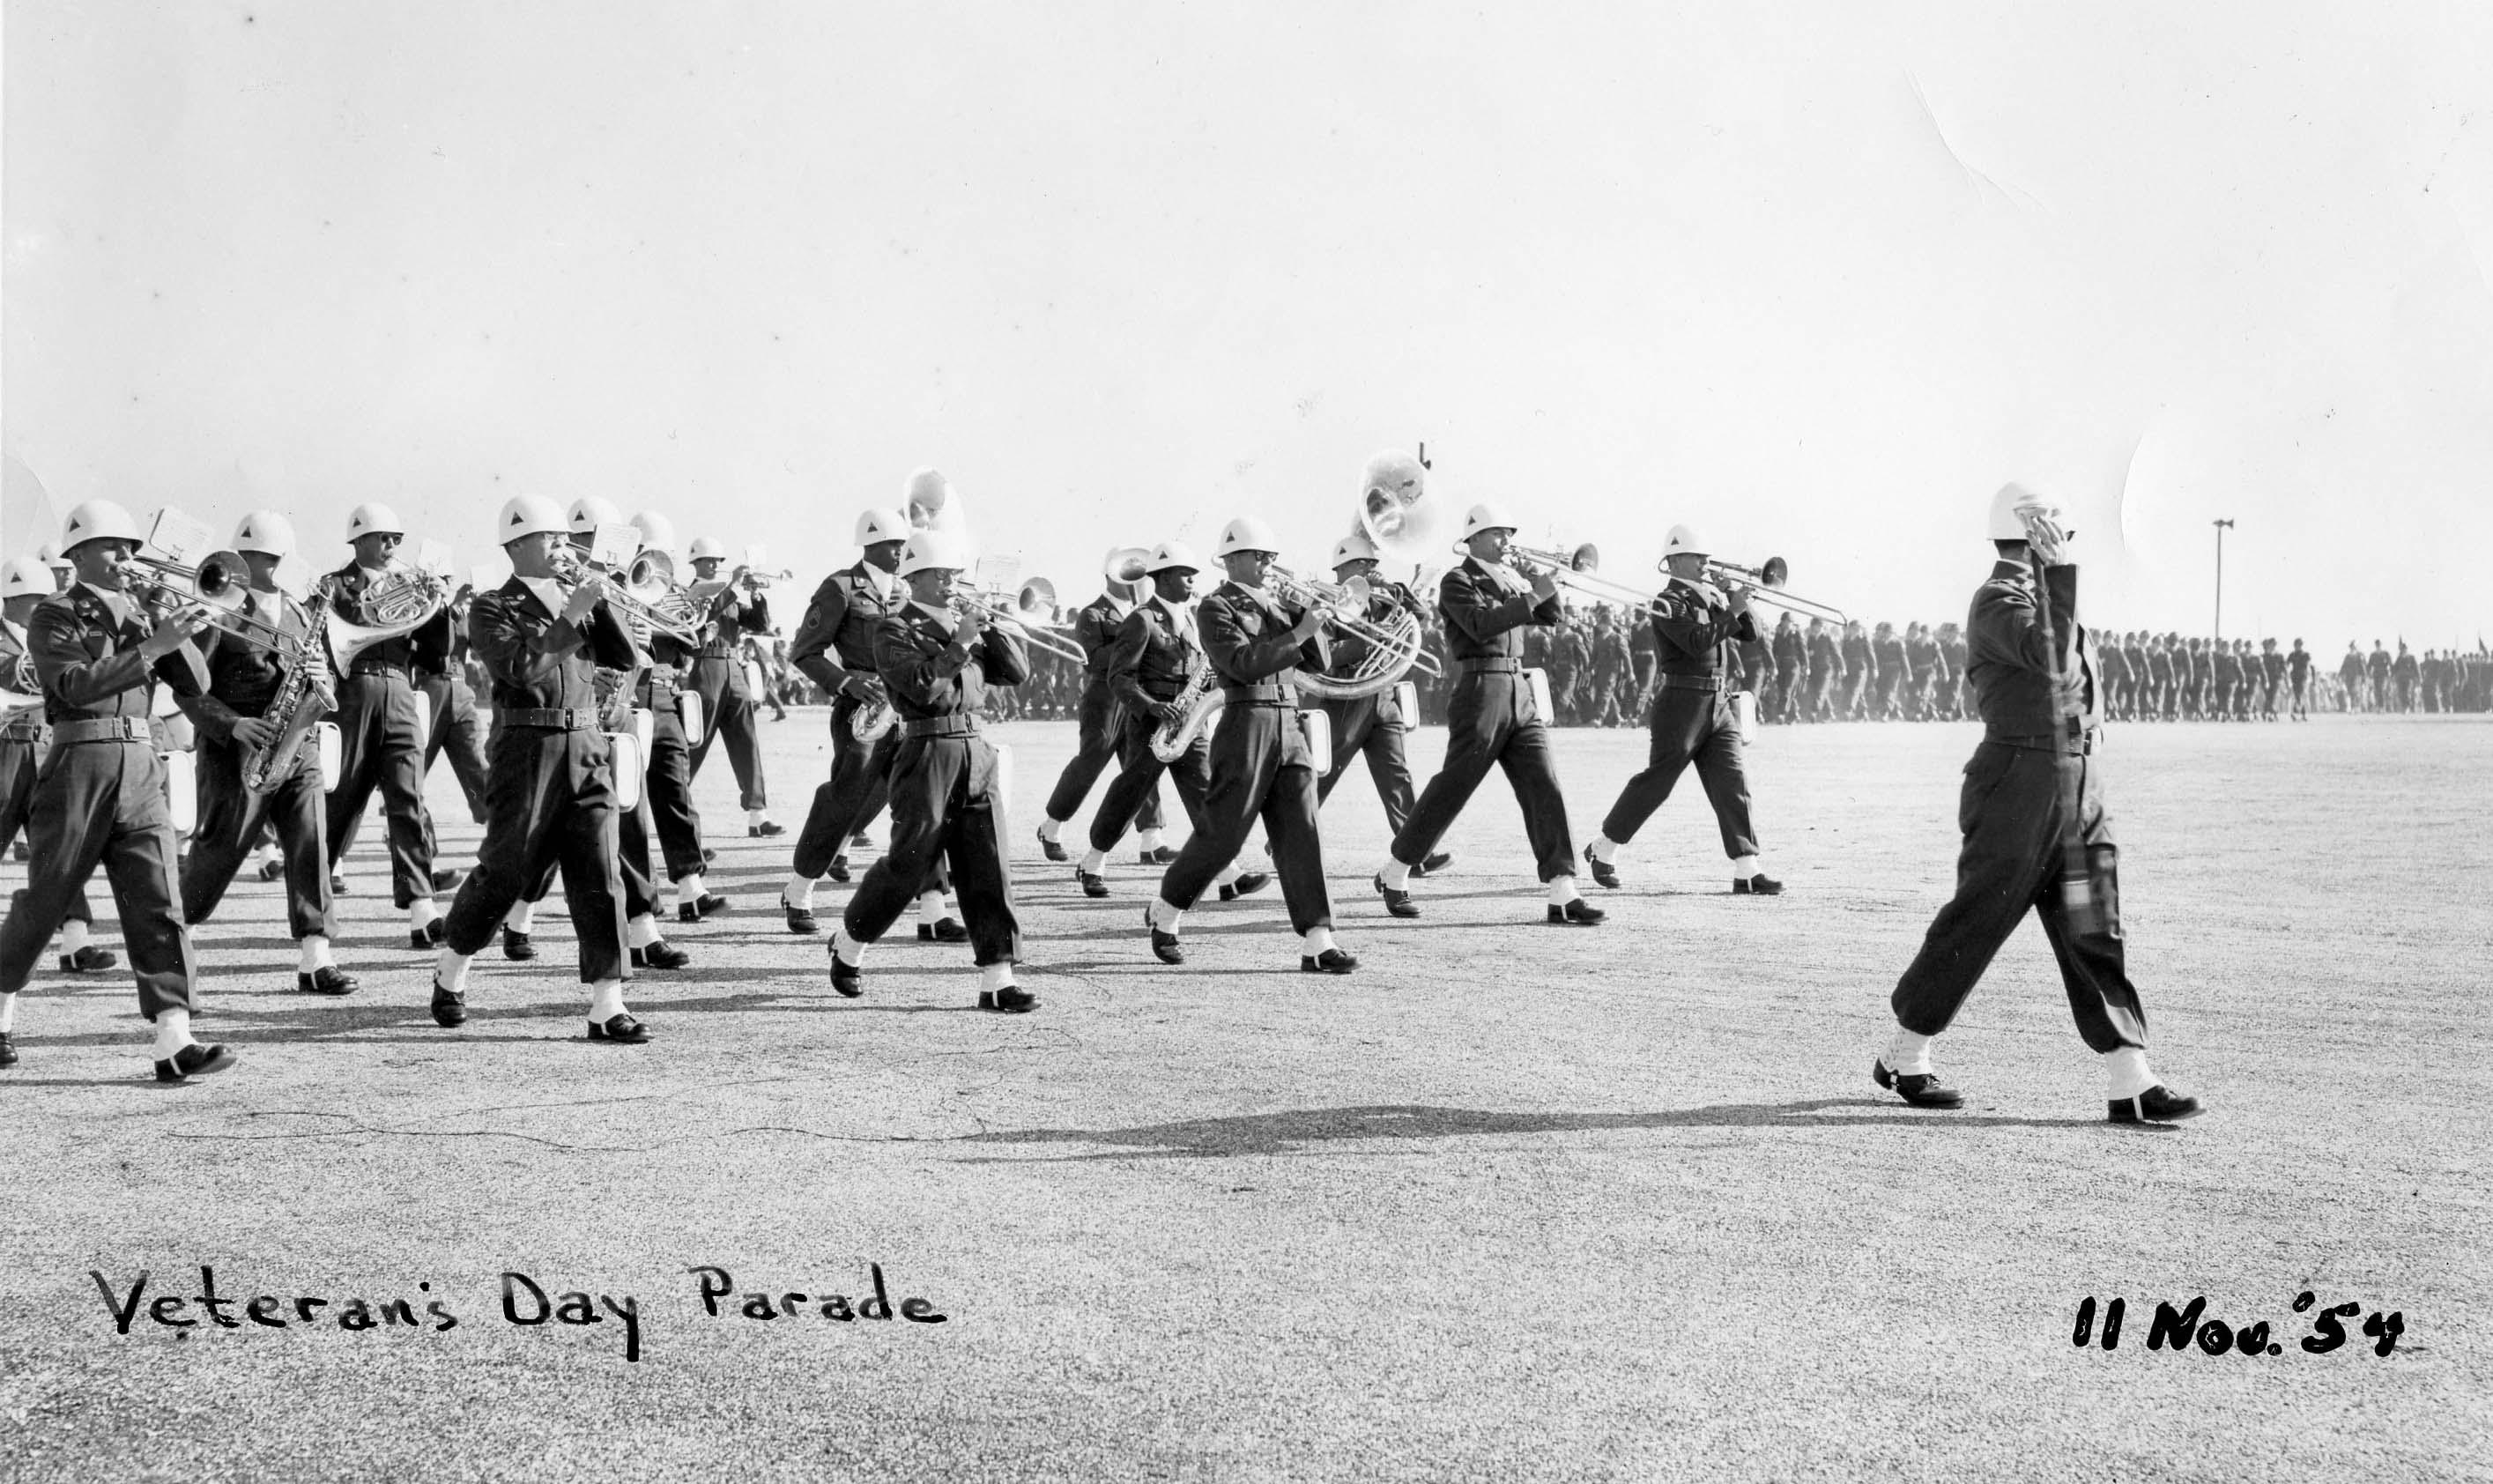 Veteran's Day Parade, 11 November 1954